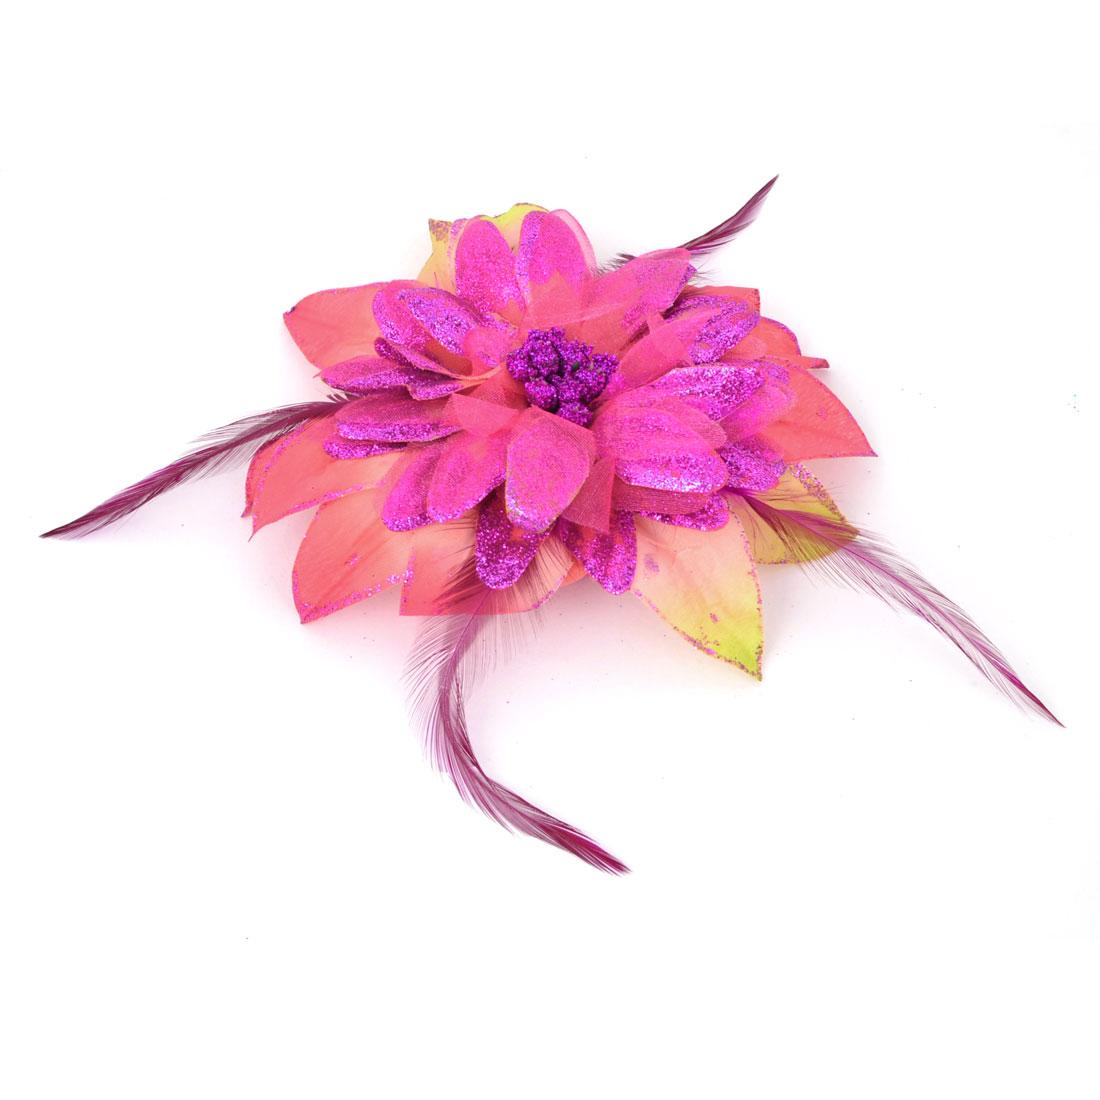 Amaranth Flower Glitter Powder Decor Alligator Hair Clip Brooch